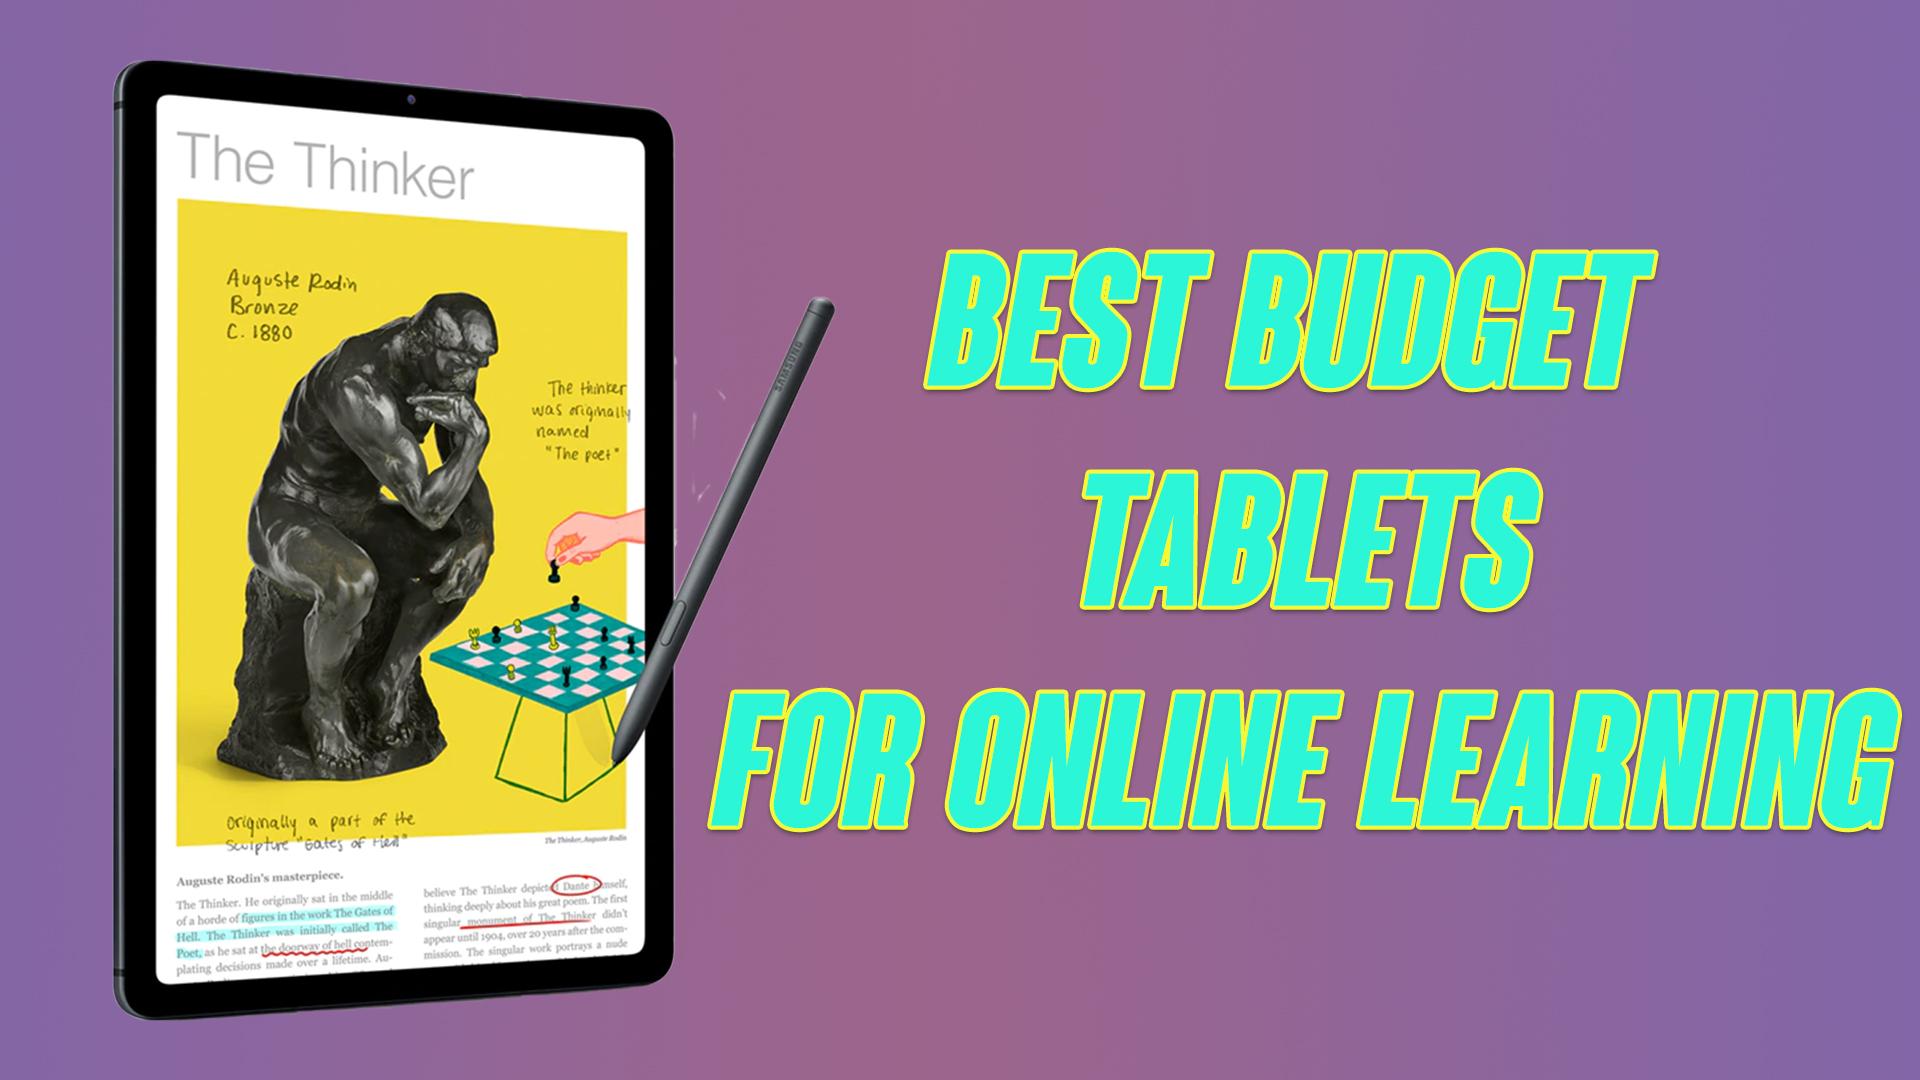 Best Pocket-Friendly Tablets for Online Learning (2020)